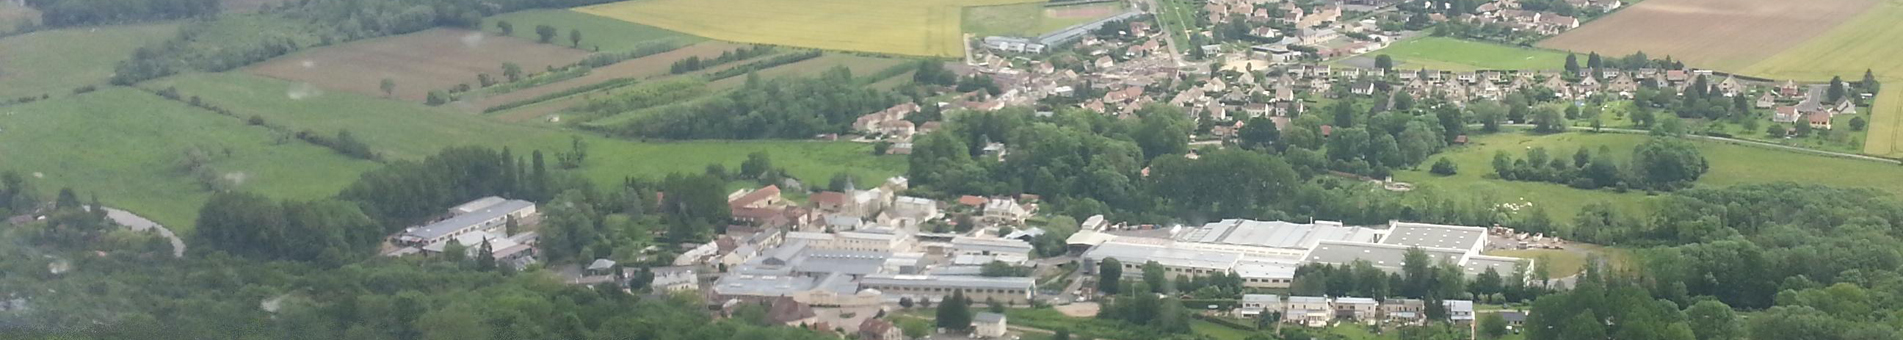 Bray-et-Lû